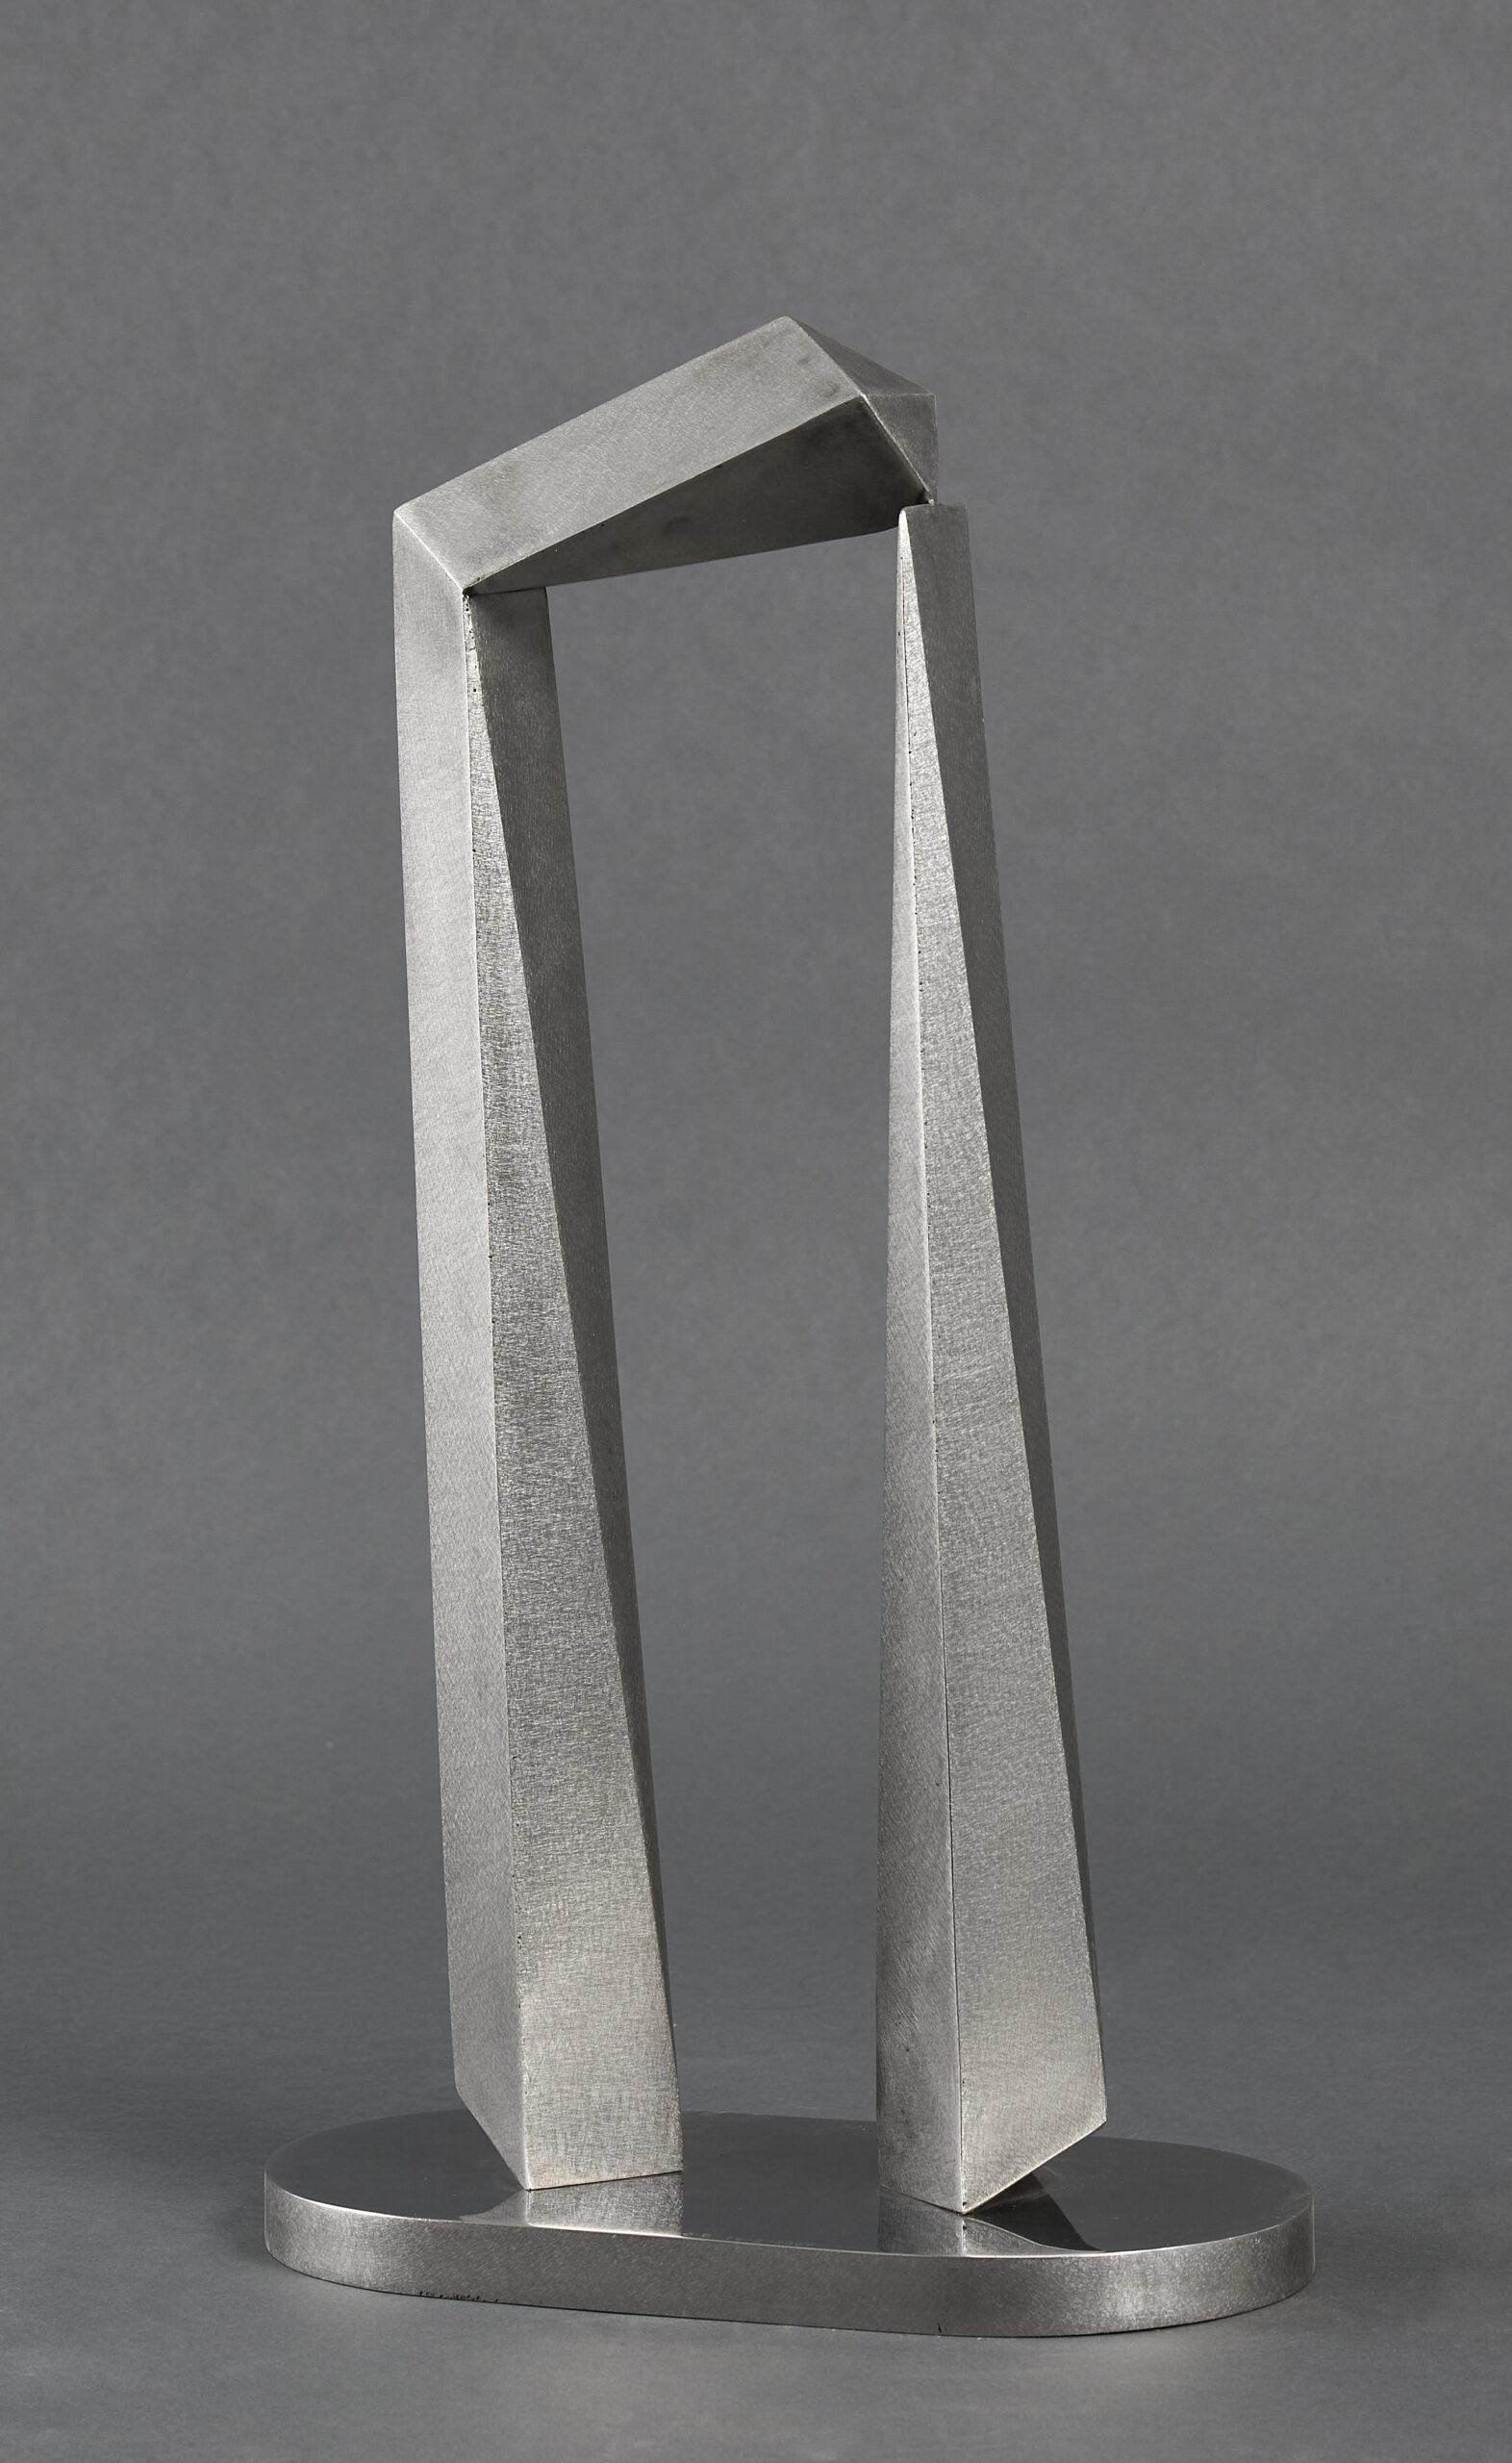 Lote 030 – Puerta de San Luis Potosí – Aço